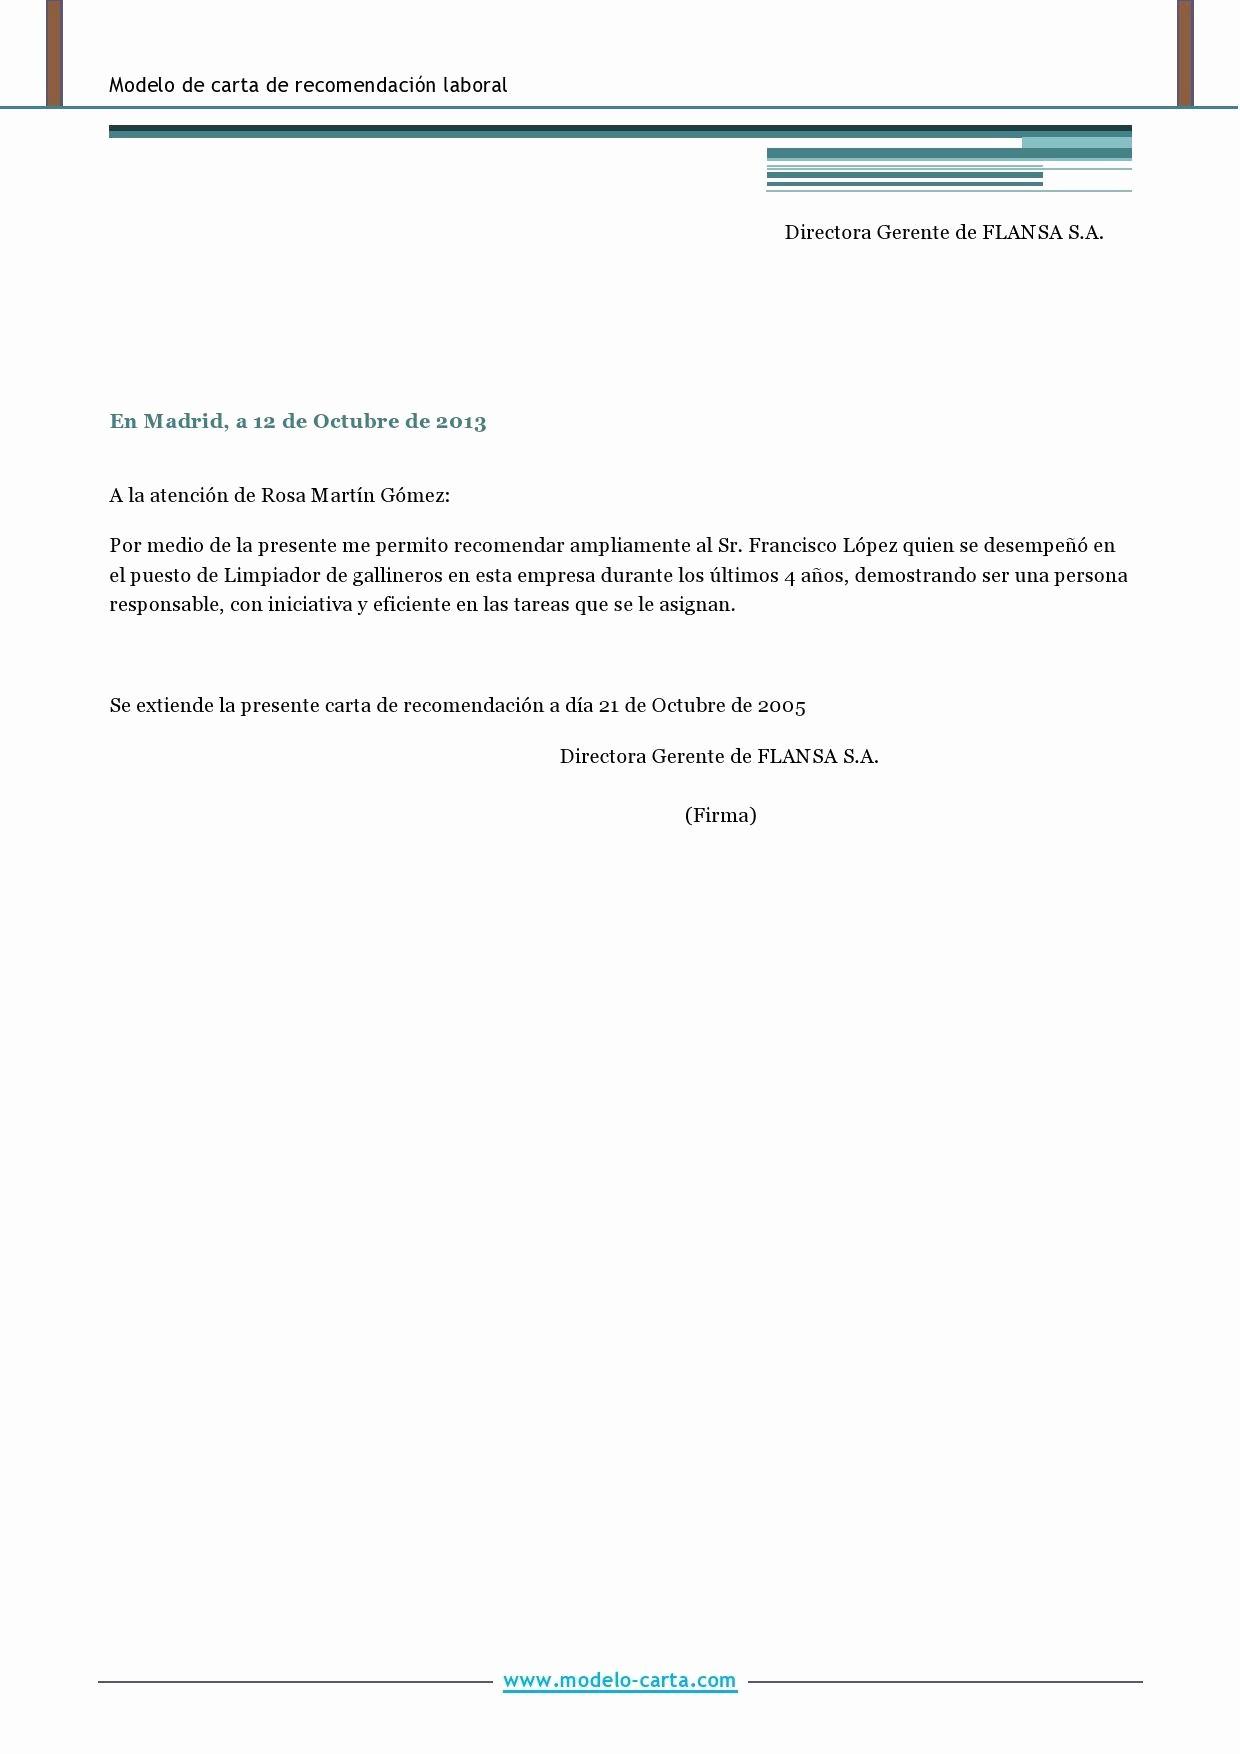 Modelos De Carta De Recomendacion Unique Carta Responsiva formato